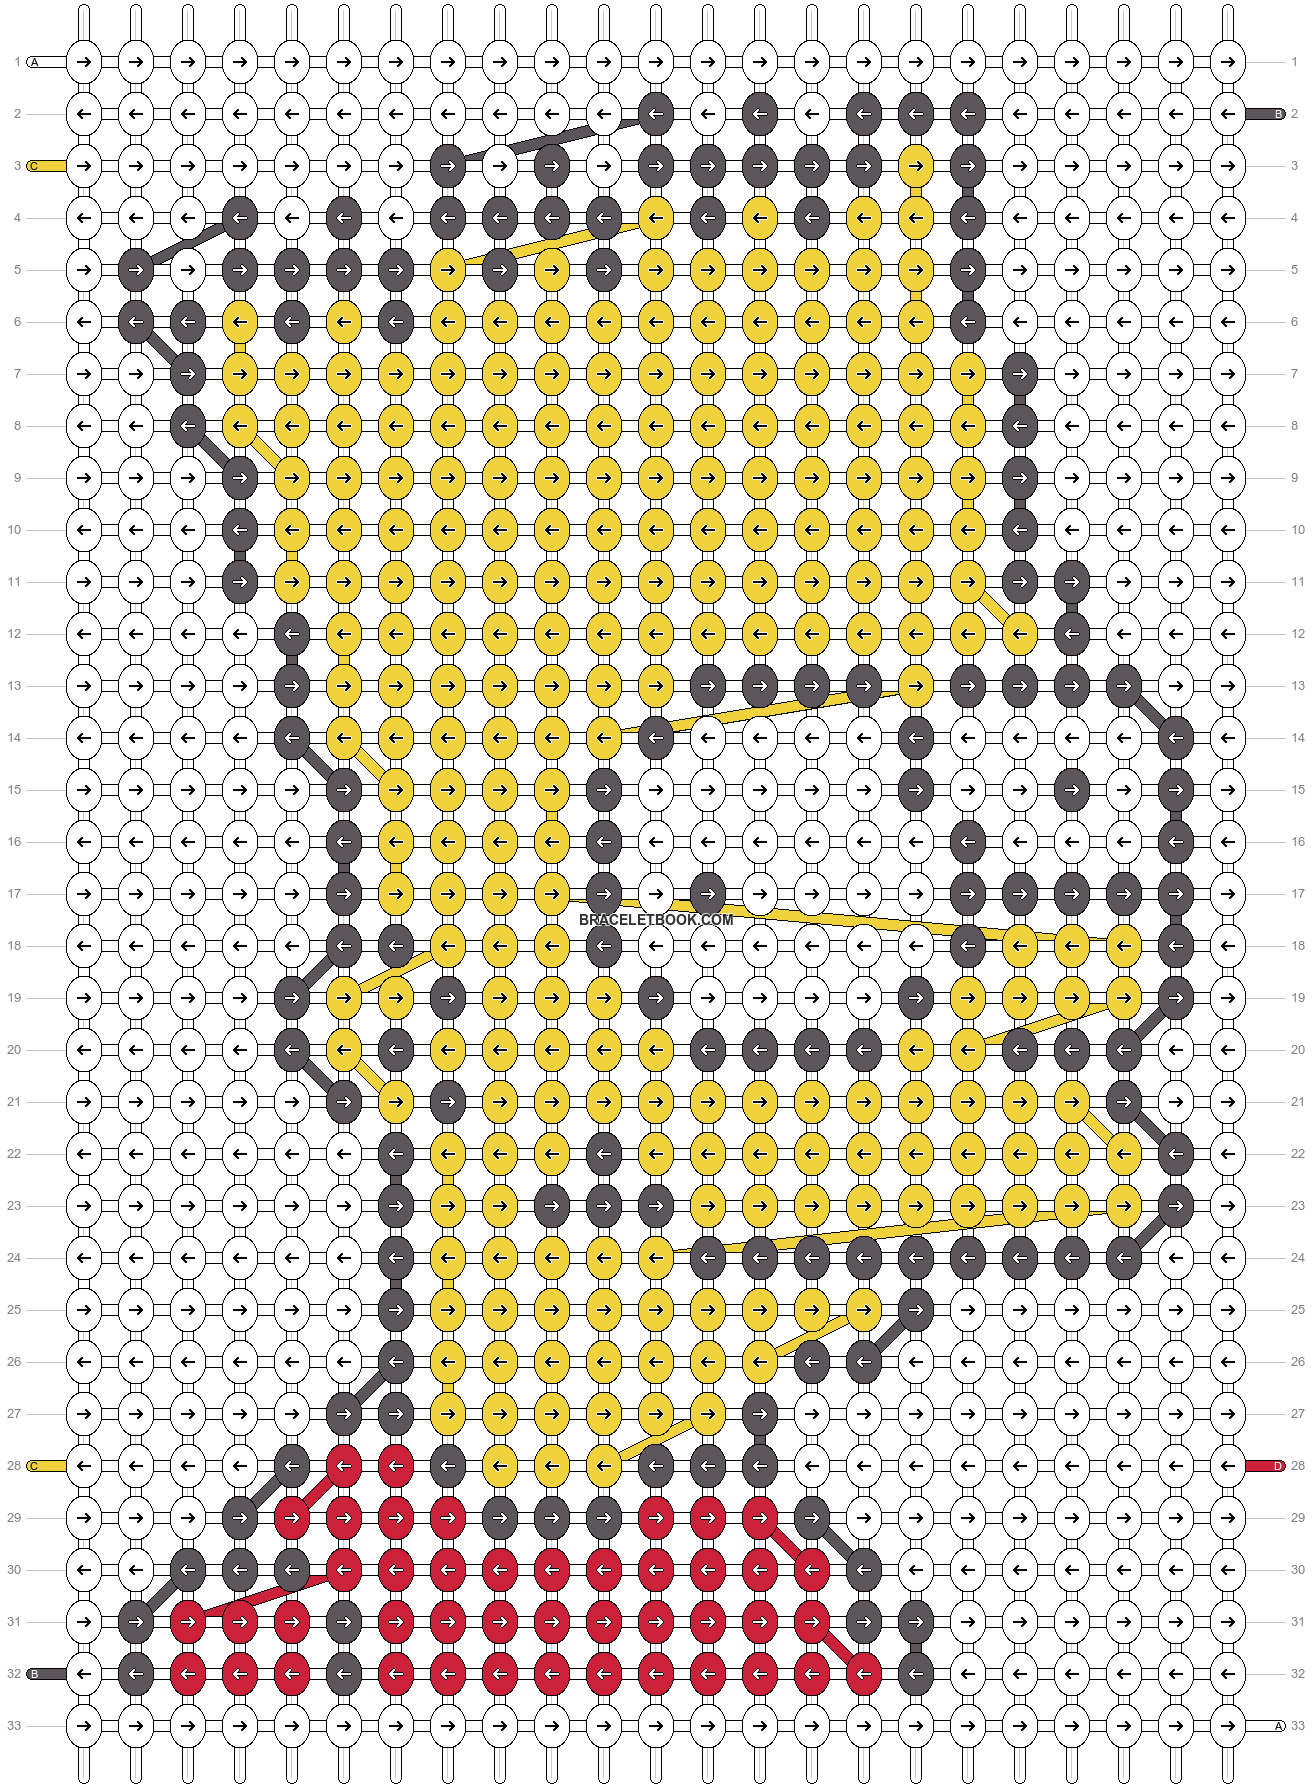 Alpha Pattern #21857 added by biancaplem